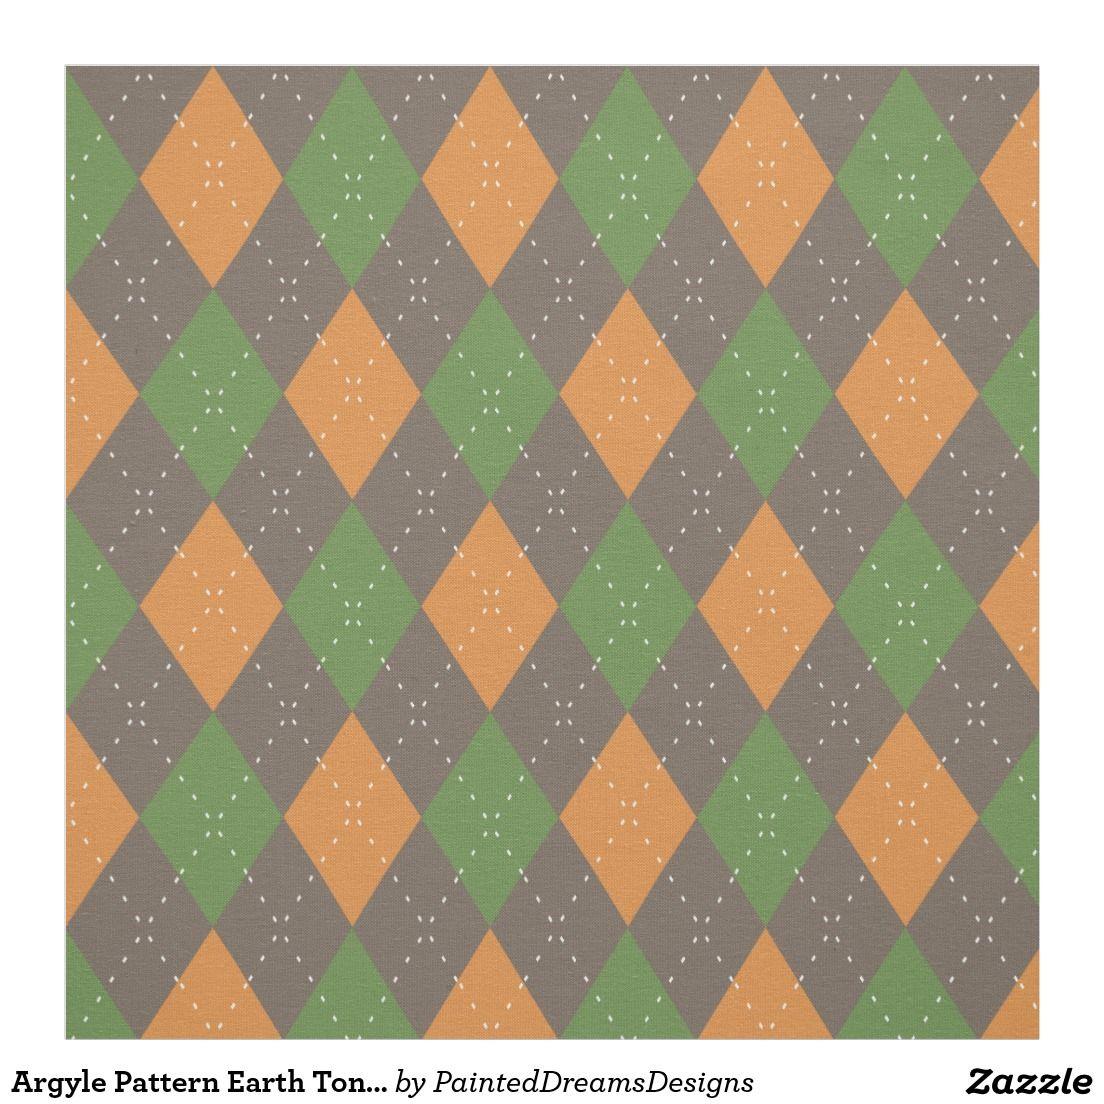 http://www.zazzle.com/argyle_pattern_earth_tones_fabric-256980887077359171